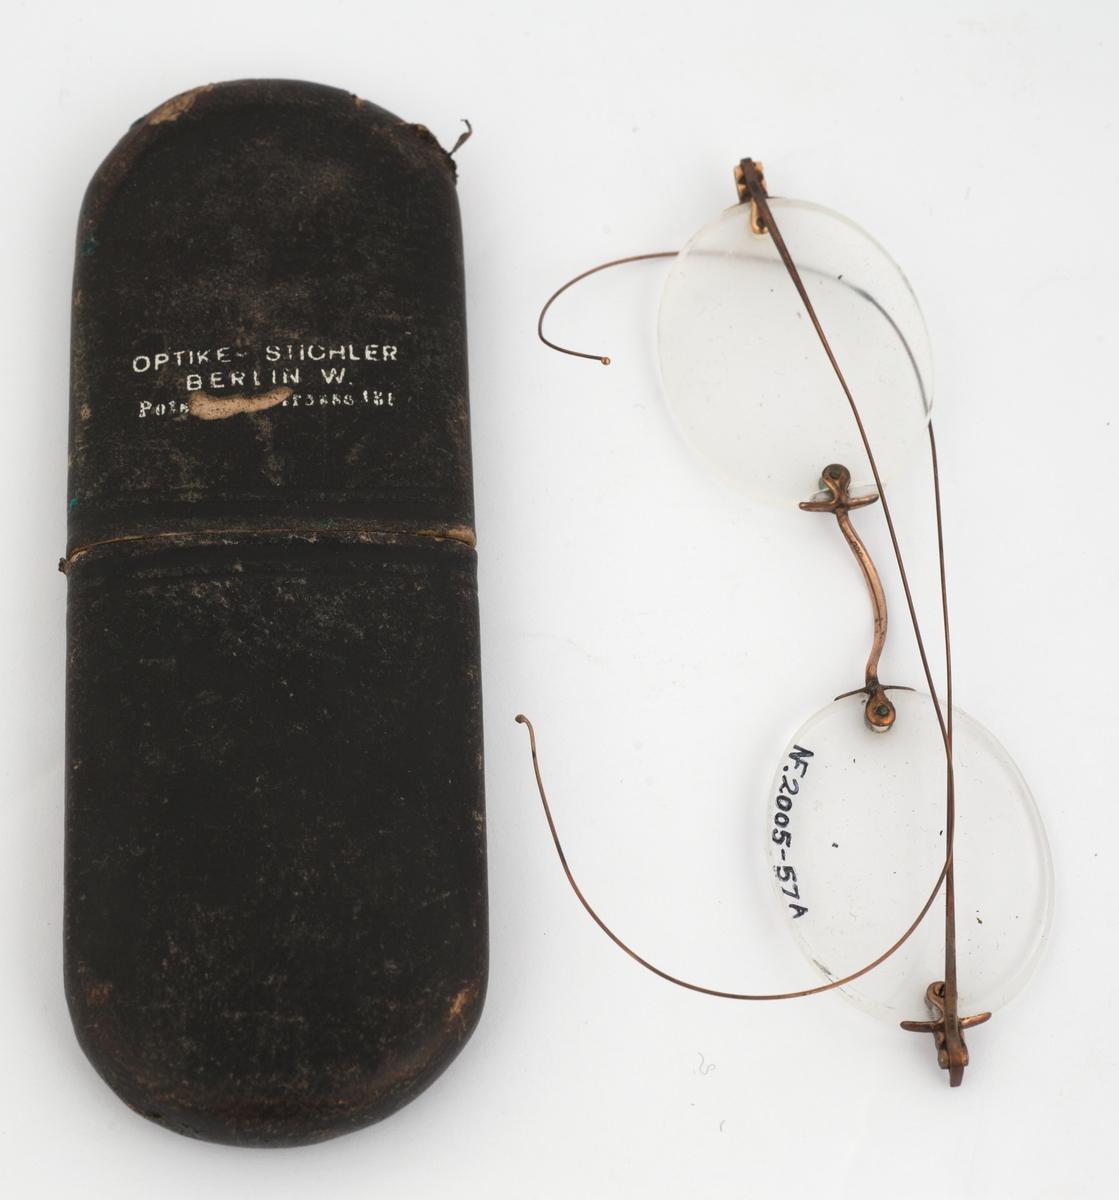 Uinnfattede briller med brillestenger av tynn metalltråd. Futteral i to deler.